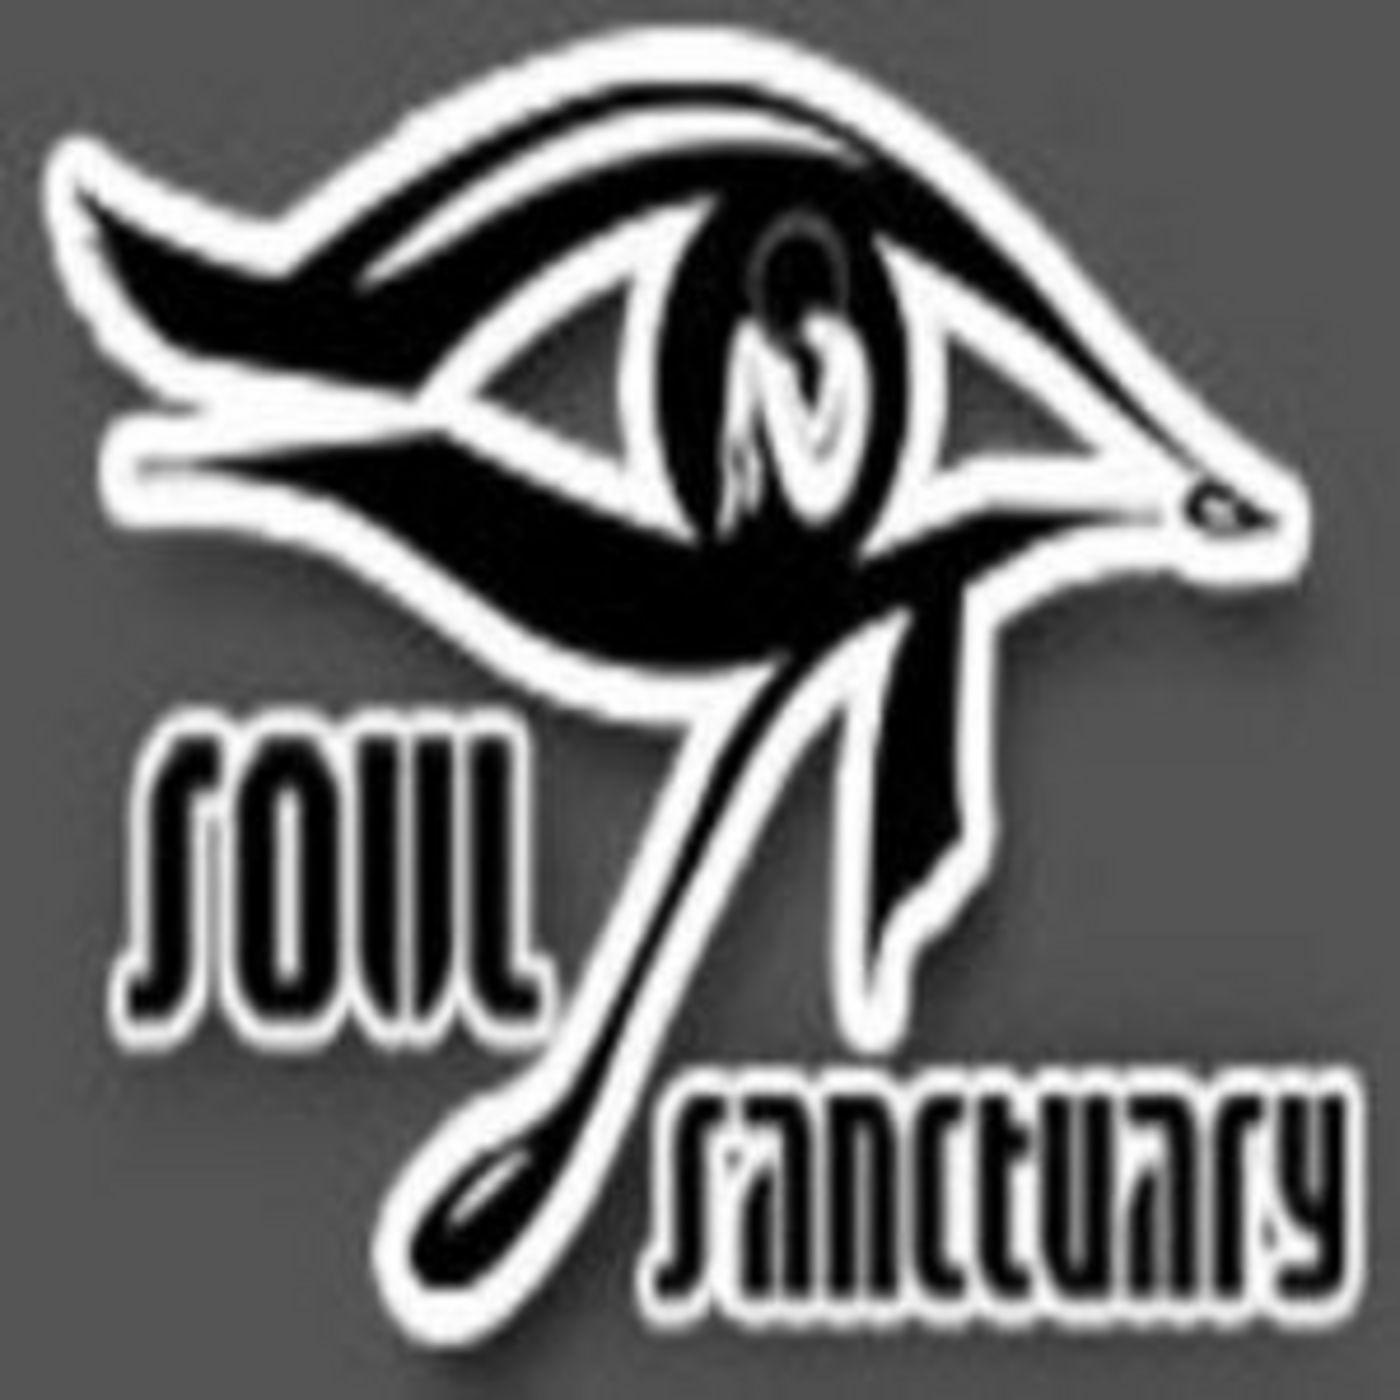 <![CDATA[Soul Sanctuary Radio]]>